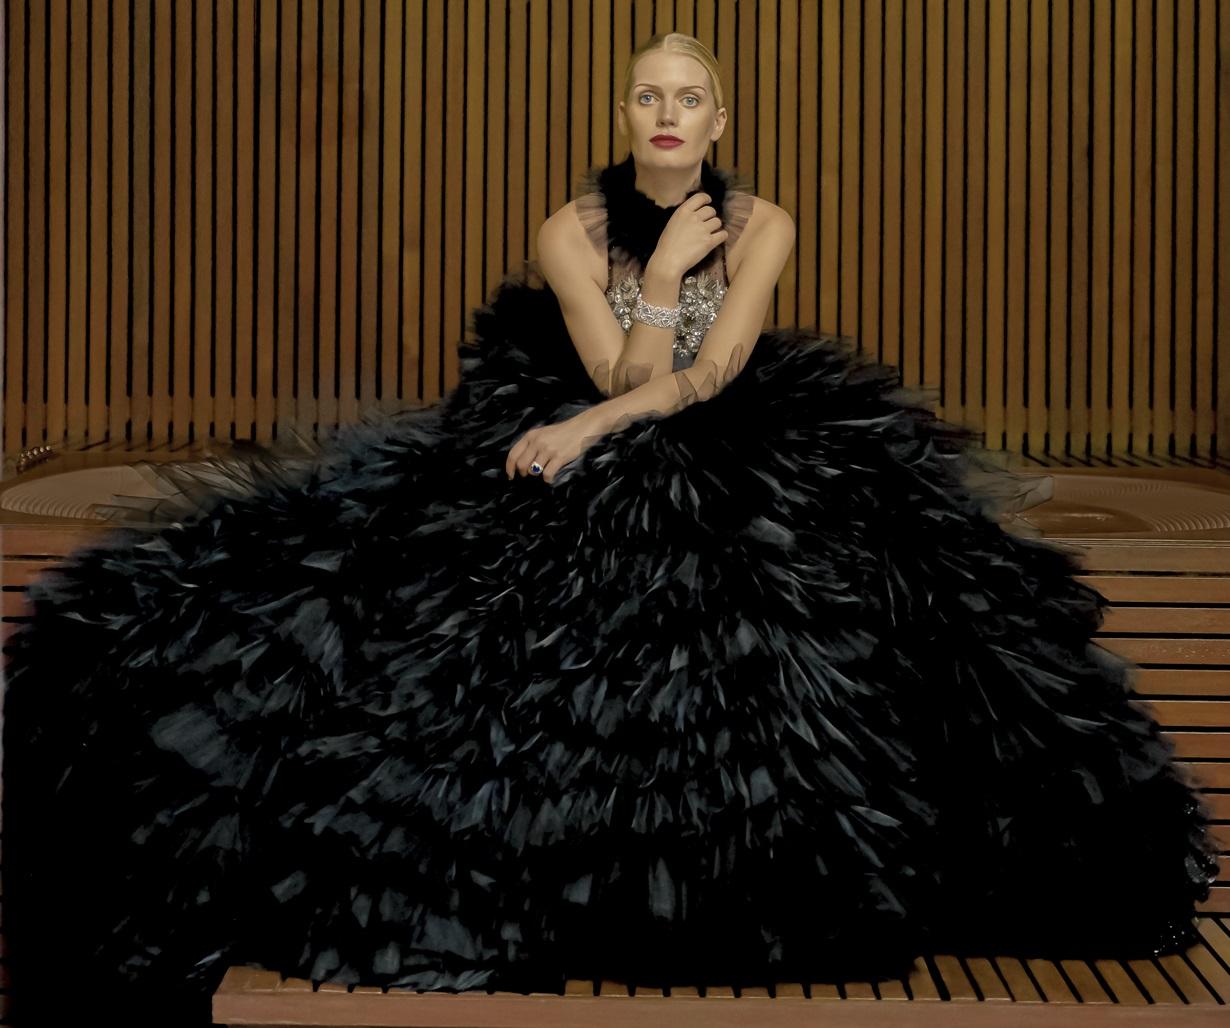 https://files.vogue.co.th/uploads/jpeg_Princess_in_black_dress2.jpg